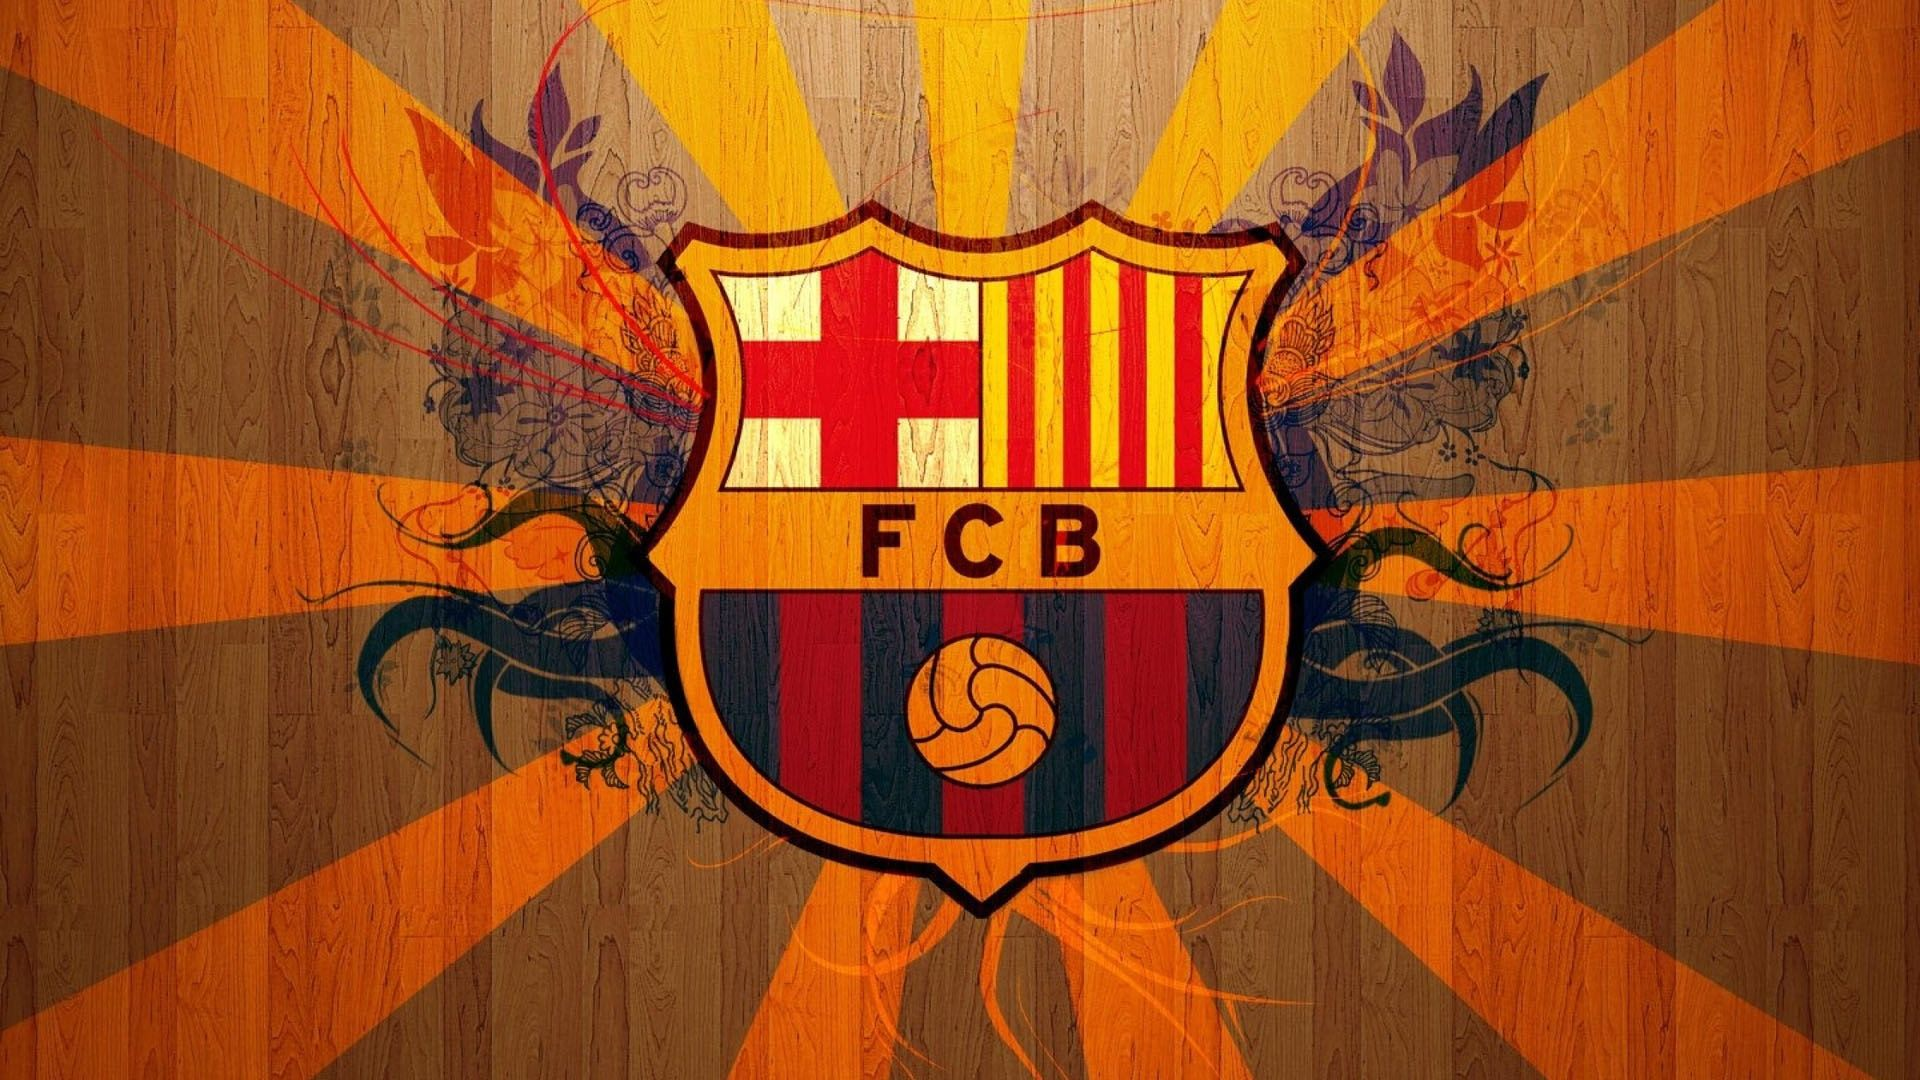 FC Barcelona Wallpapers At Http Wwwhdwallcloudcom Fc Barcelona